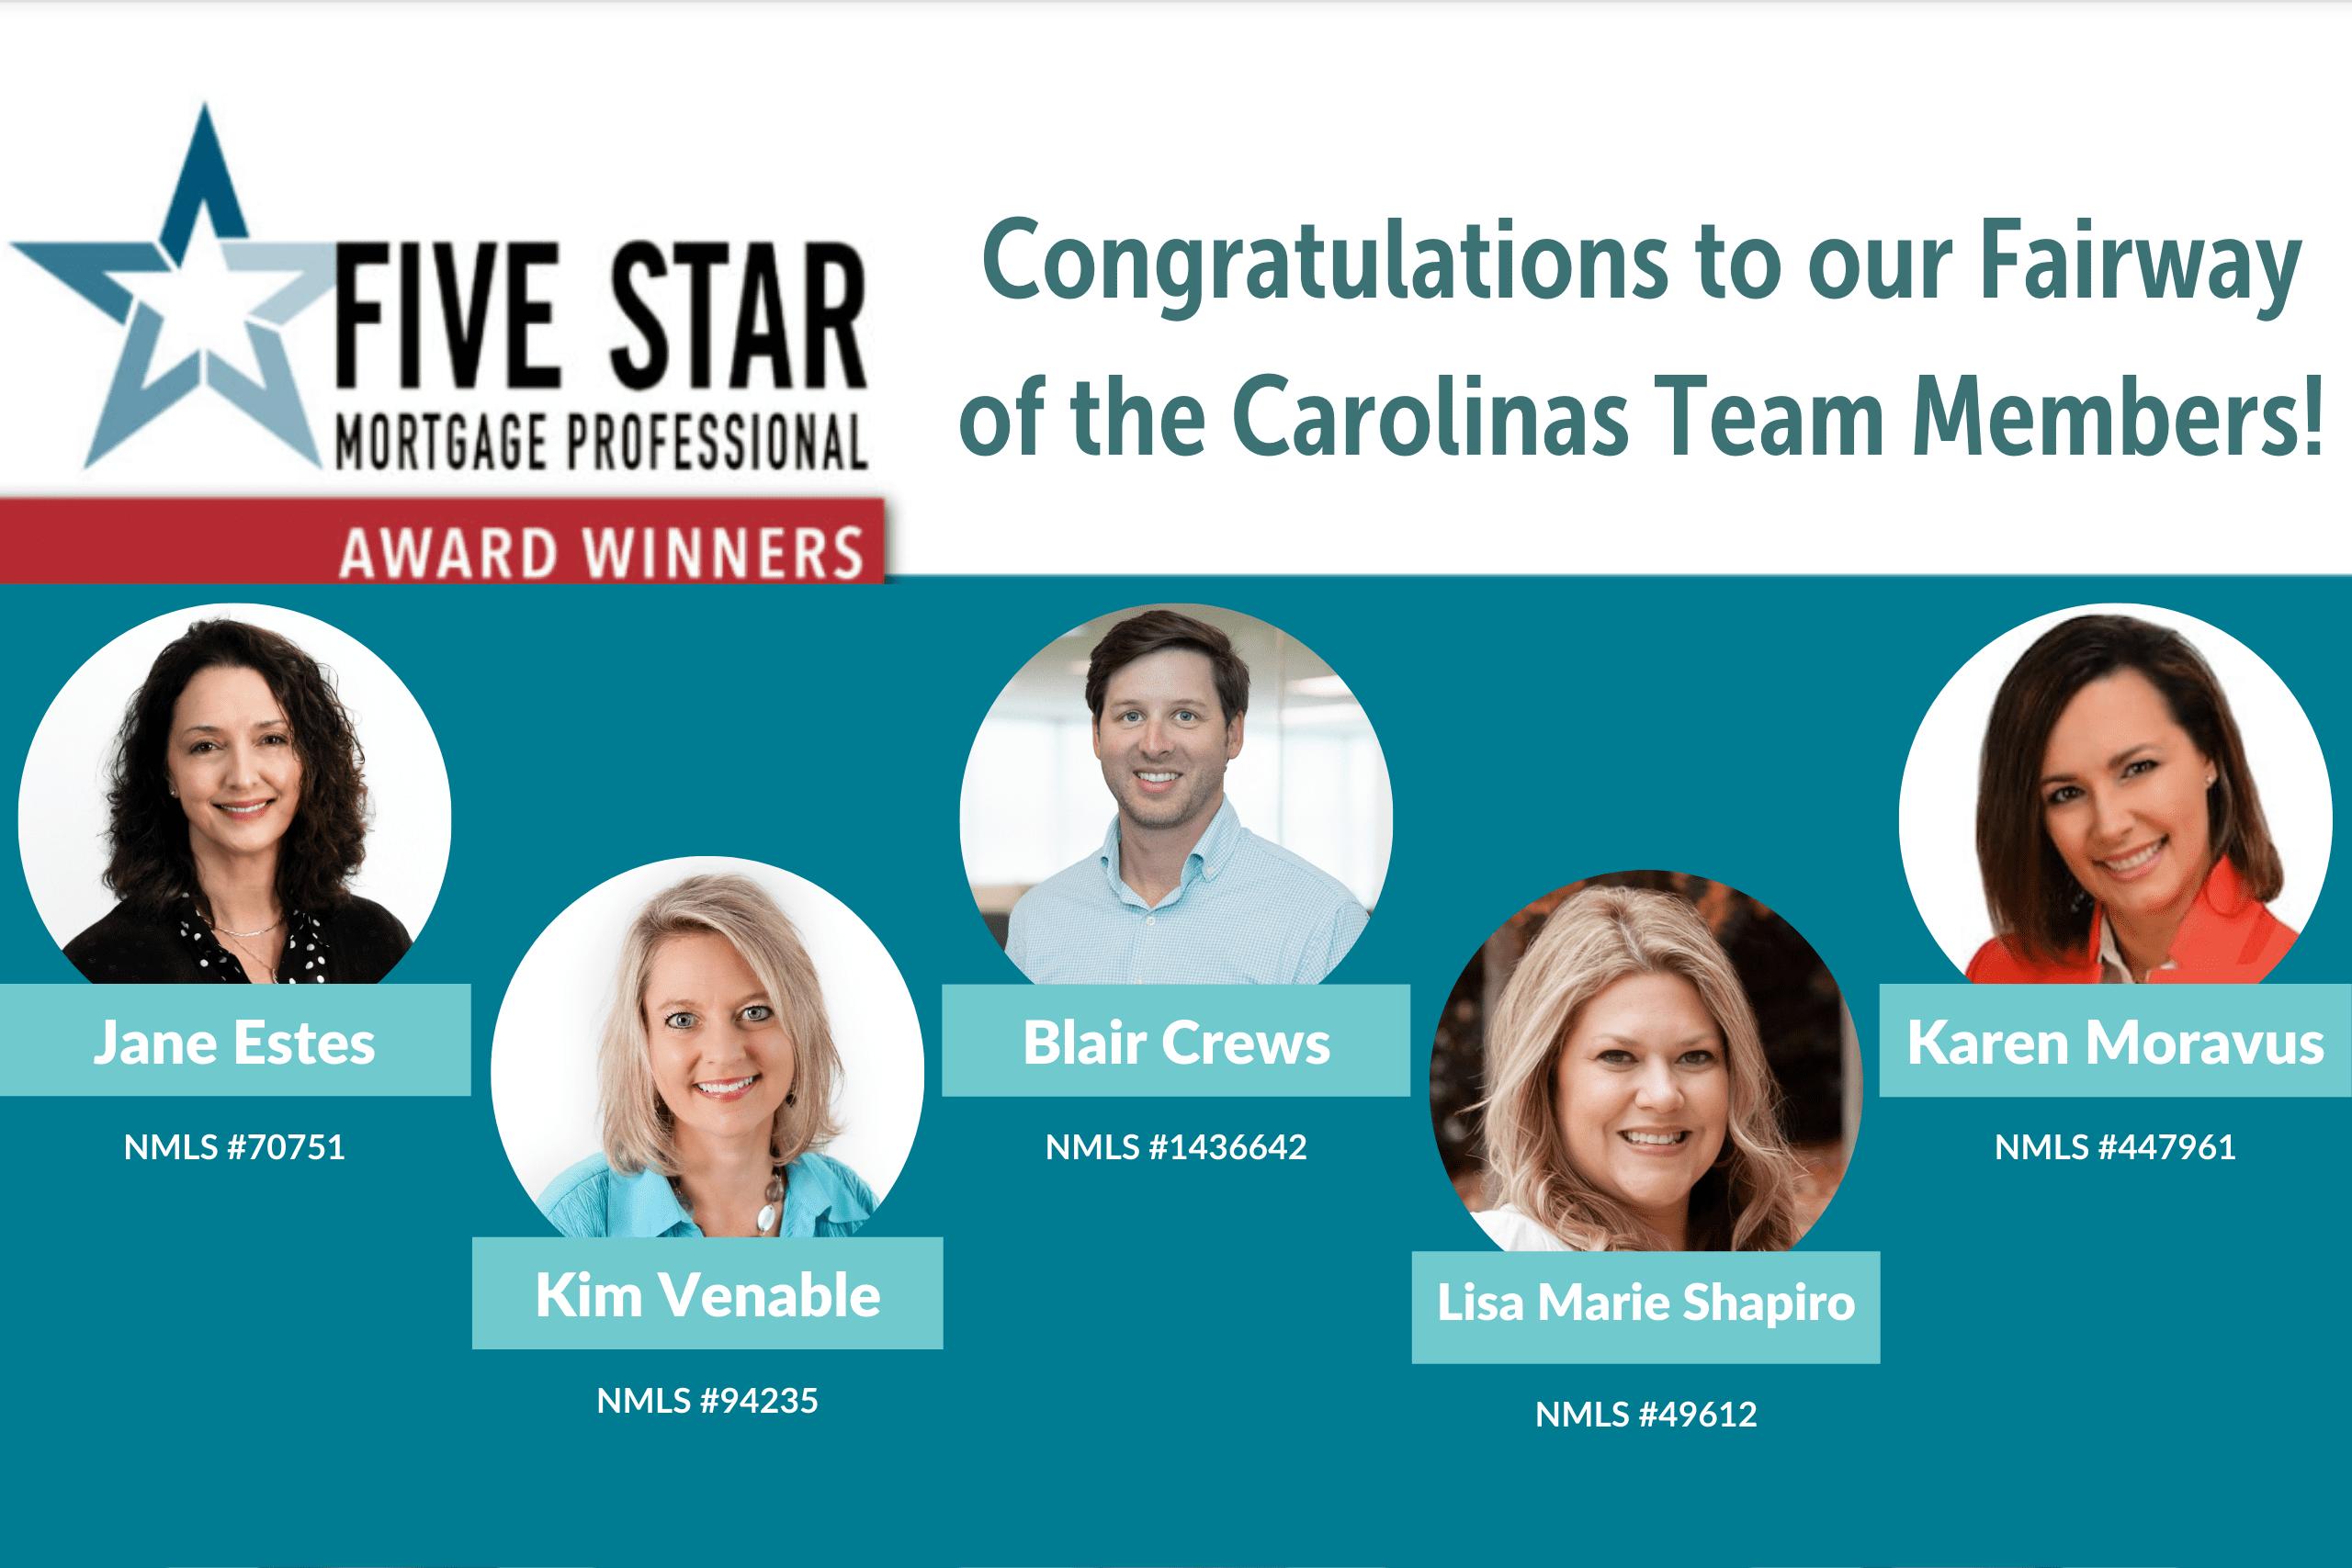 Congratulations, Five Star Award Winners from Fairway of the Carolinas